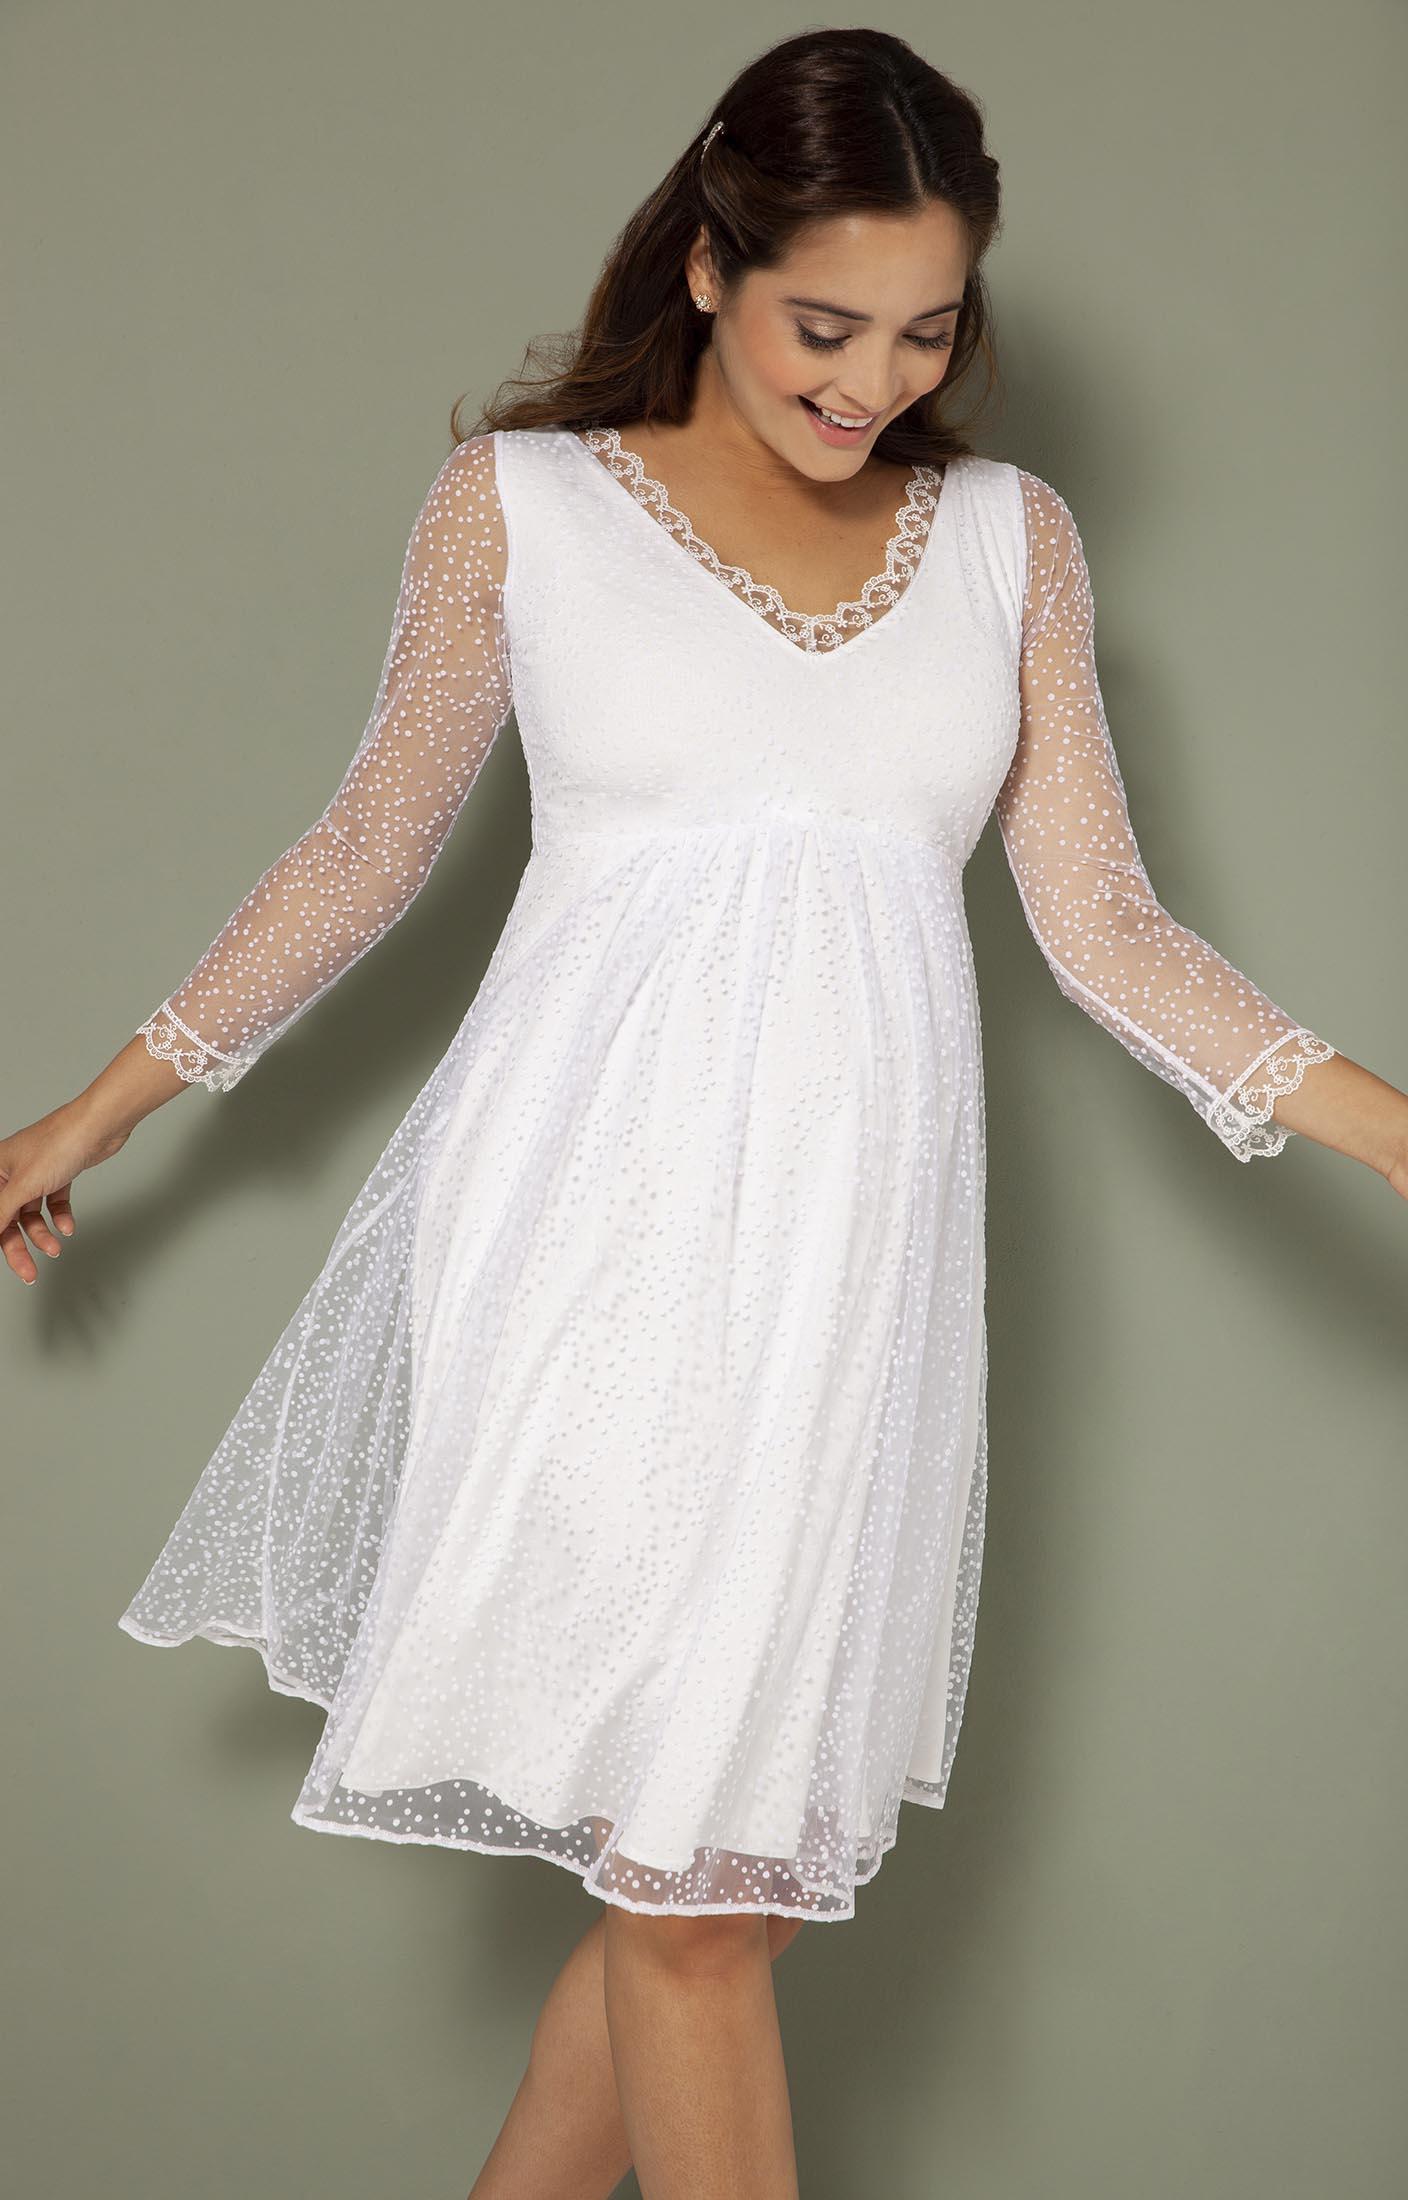 Lily Maternity Wedding Dress Short White Snow Maternity Wedding Dresses Evening Wear And Party Clothes By Tiffany Rose Us